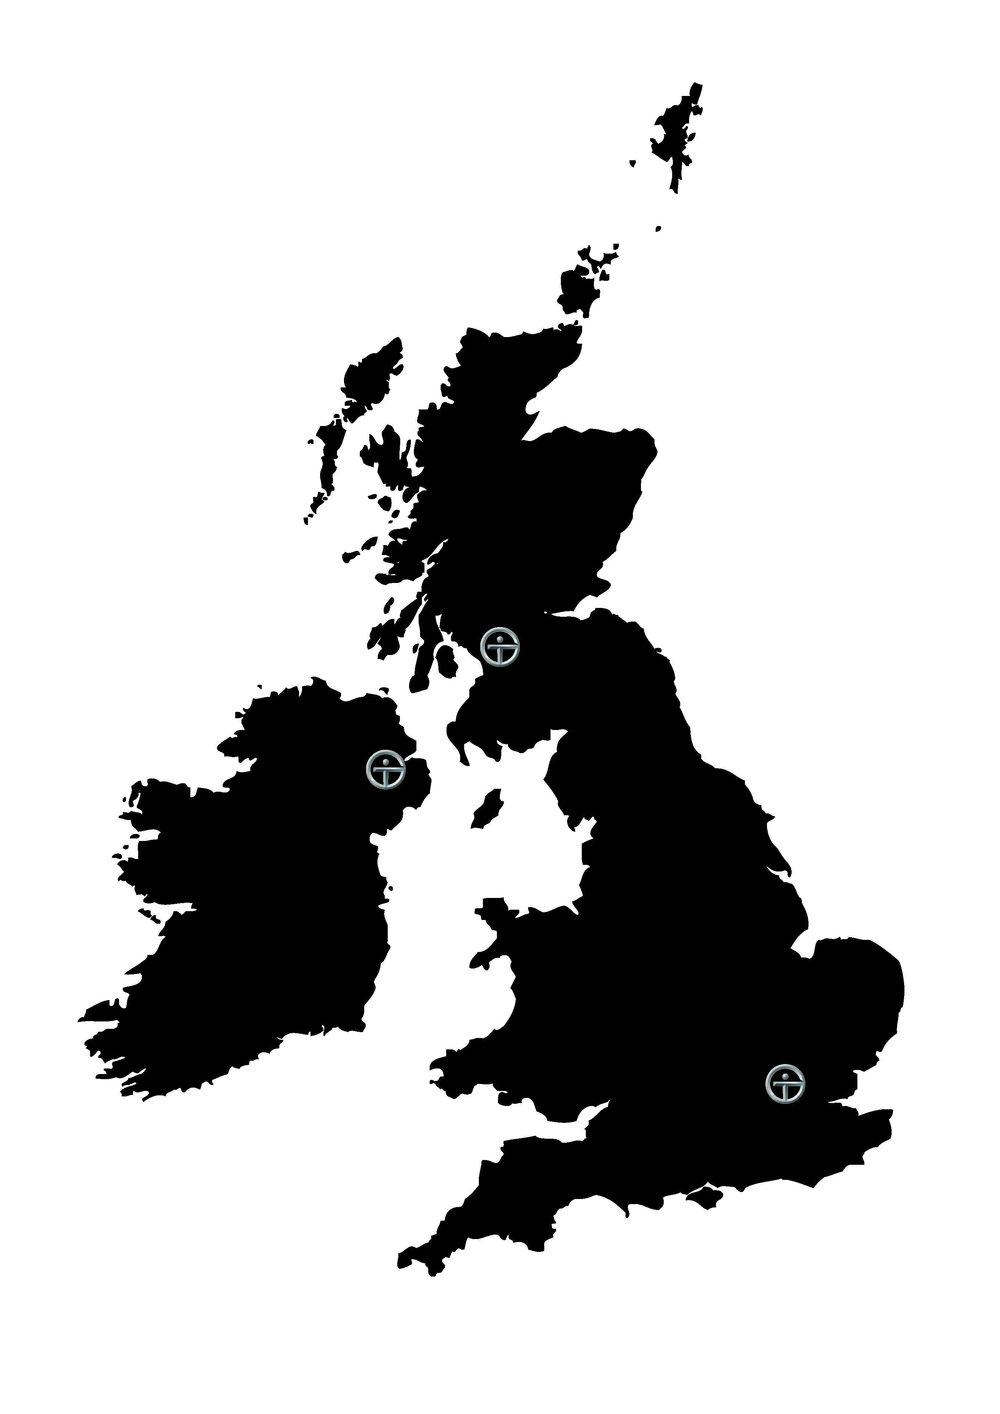 UK MAP 123.jpg